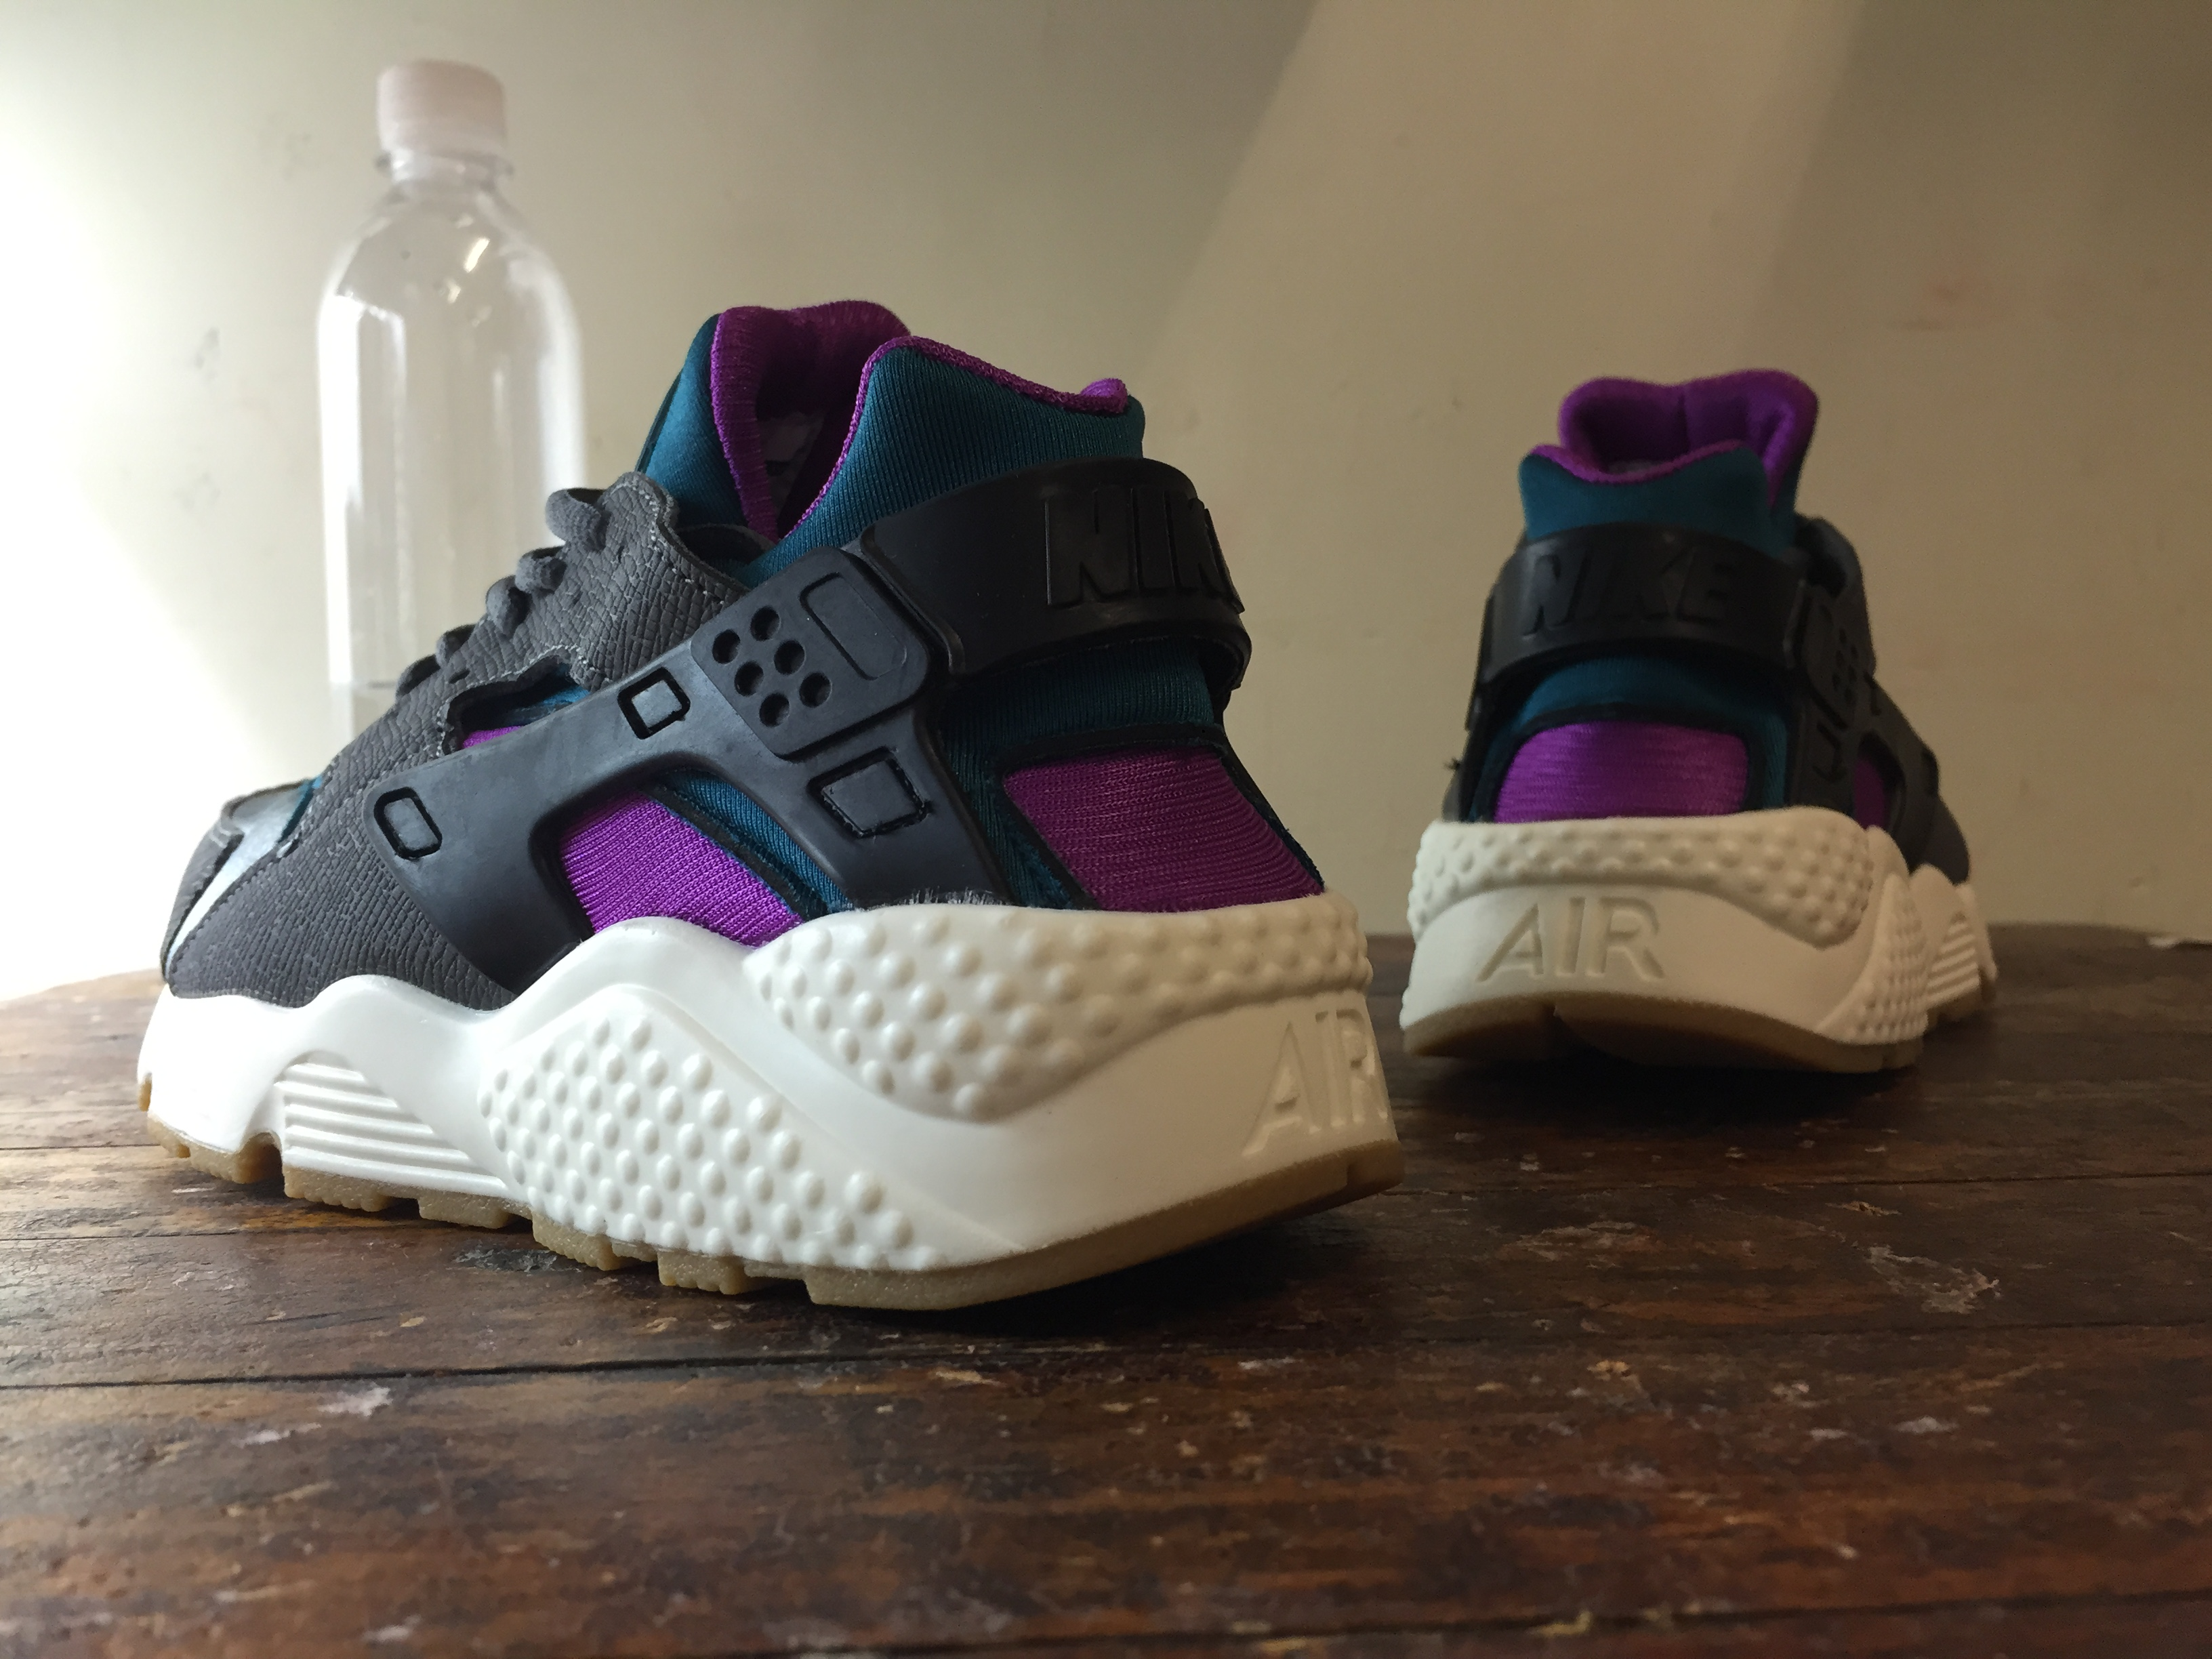 outlet store a7a5e 02657 ... australia nike air huarache grey purple 51490 adf52